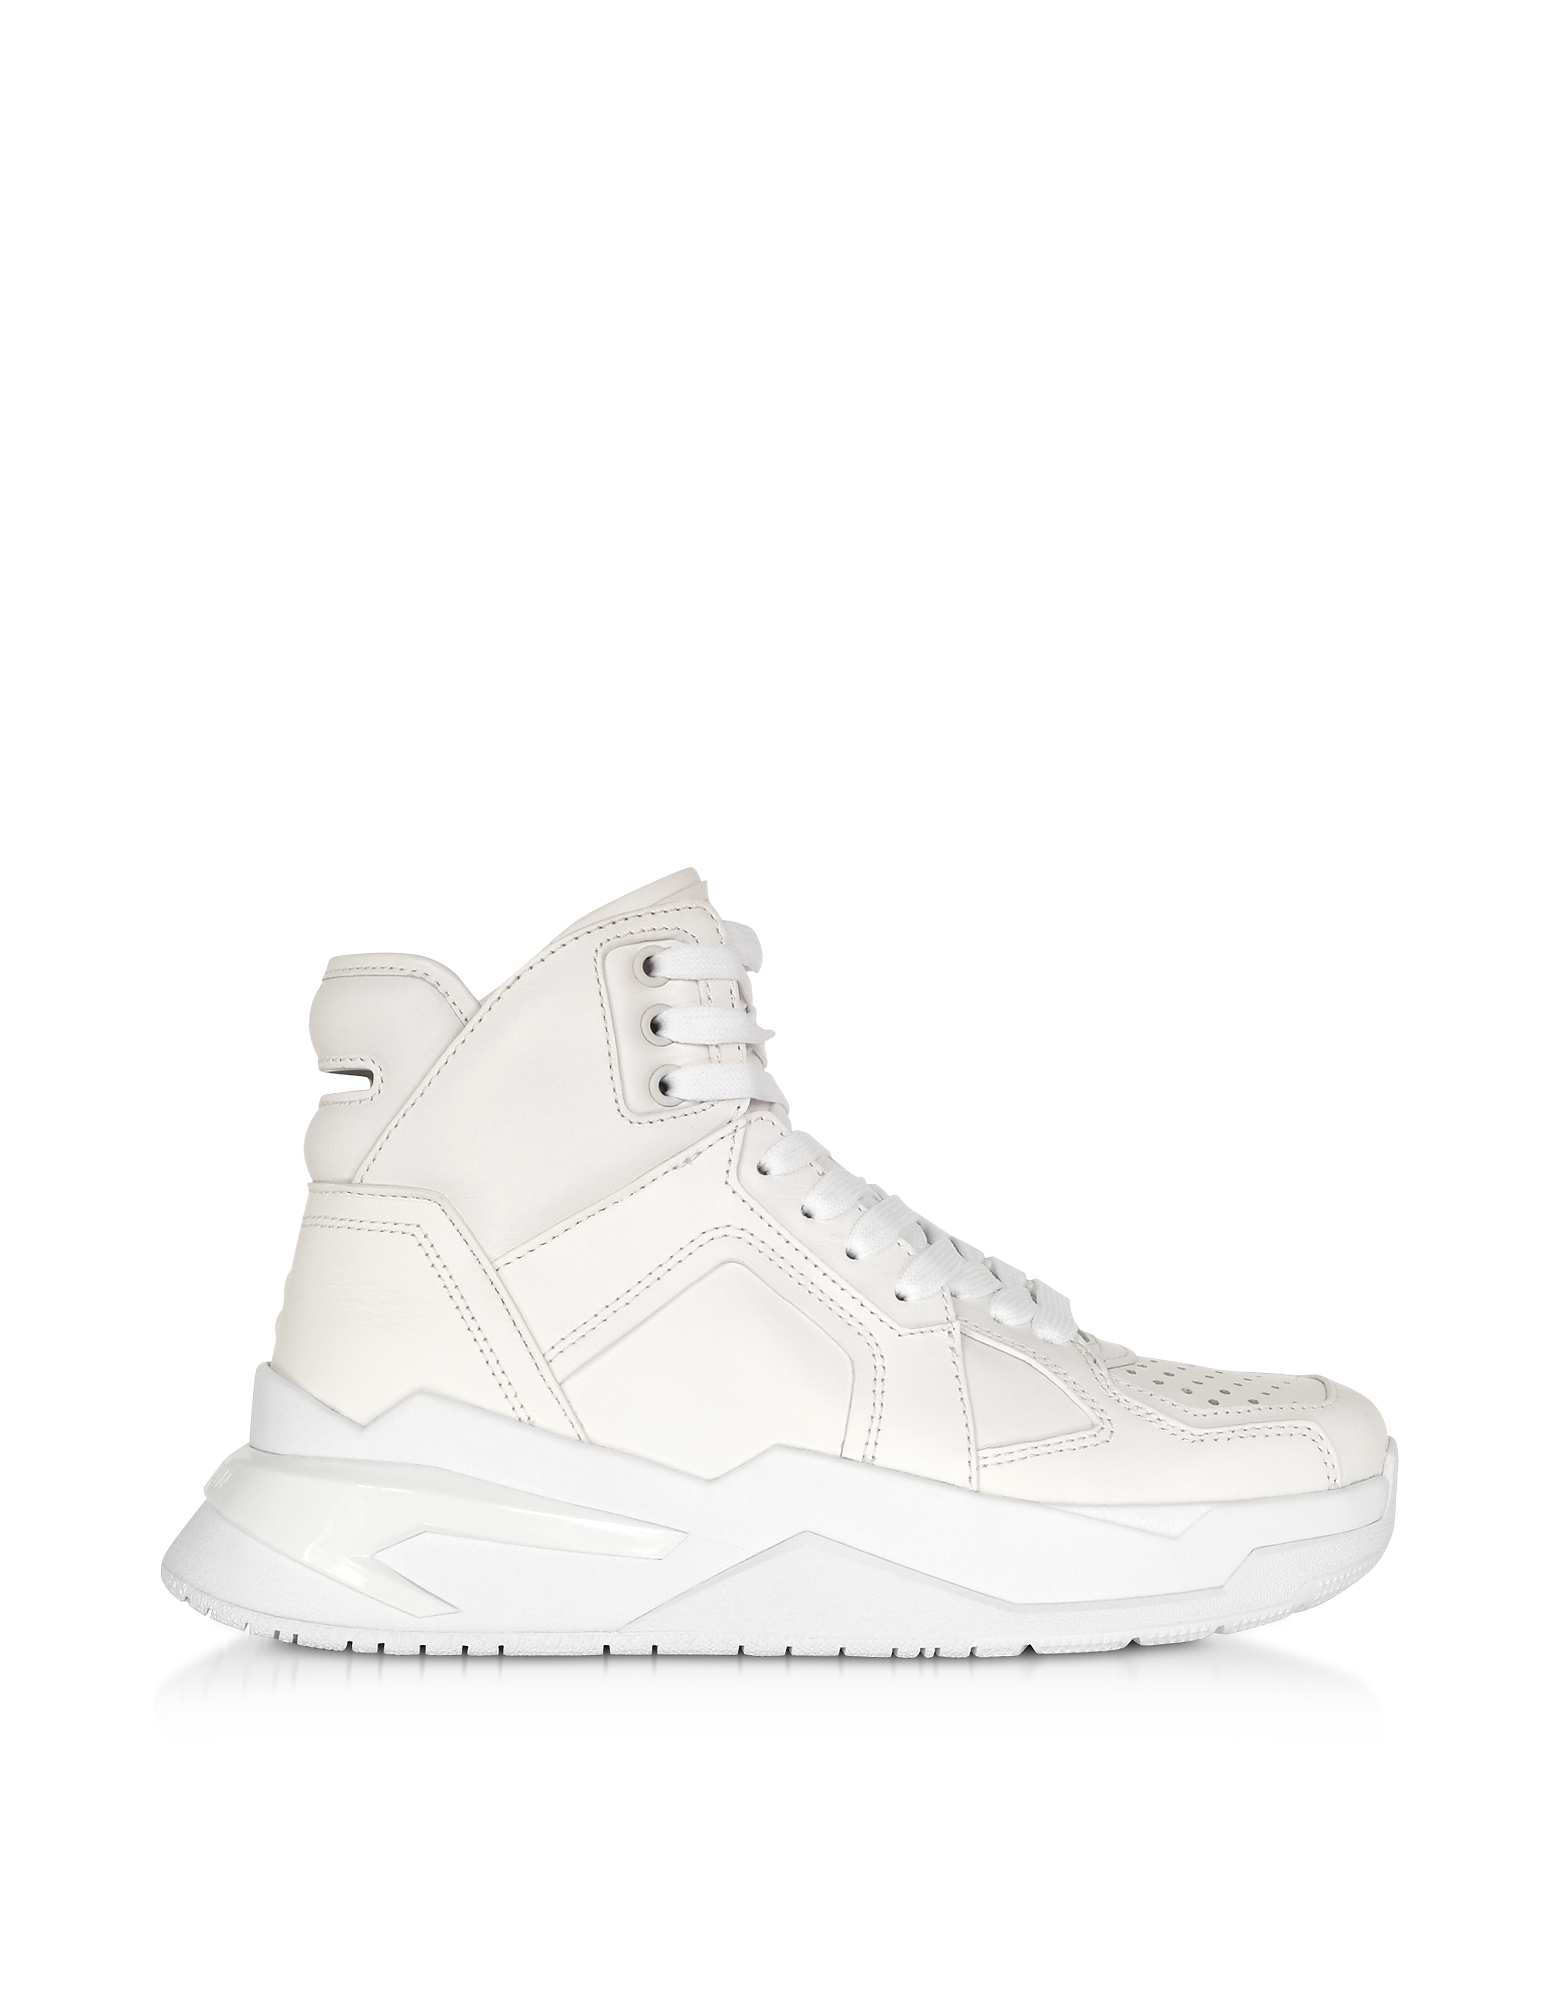 Balmain Designer Shoes, White High Top Men's B-Ball Sneakers